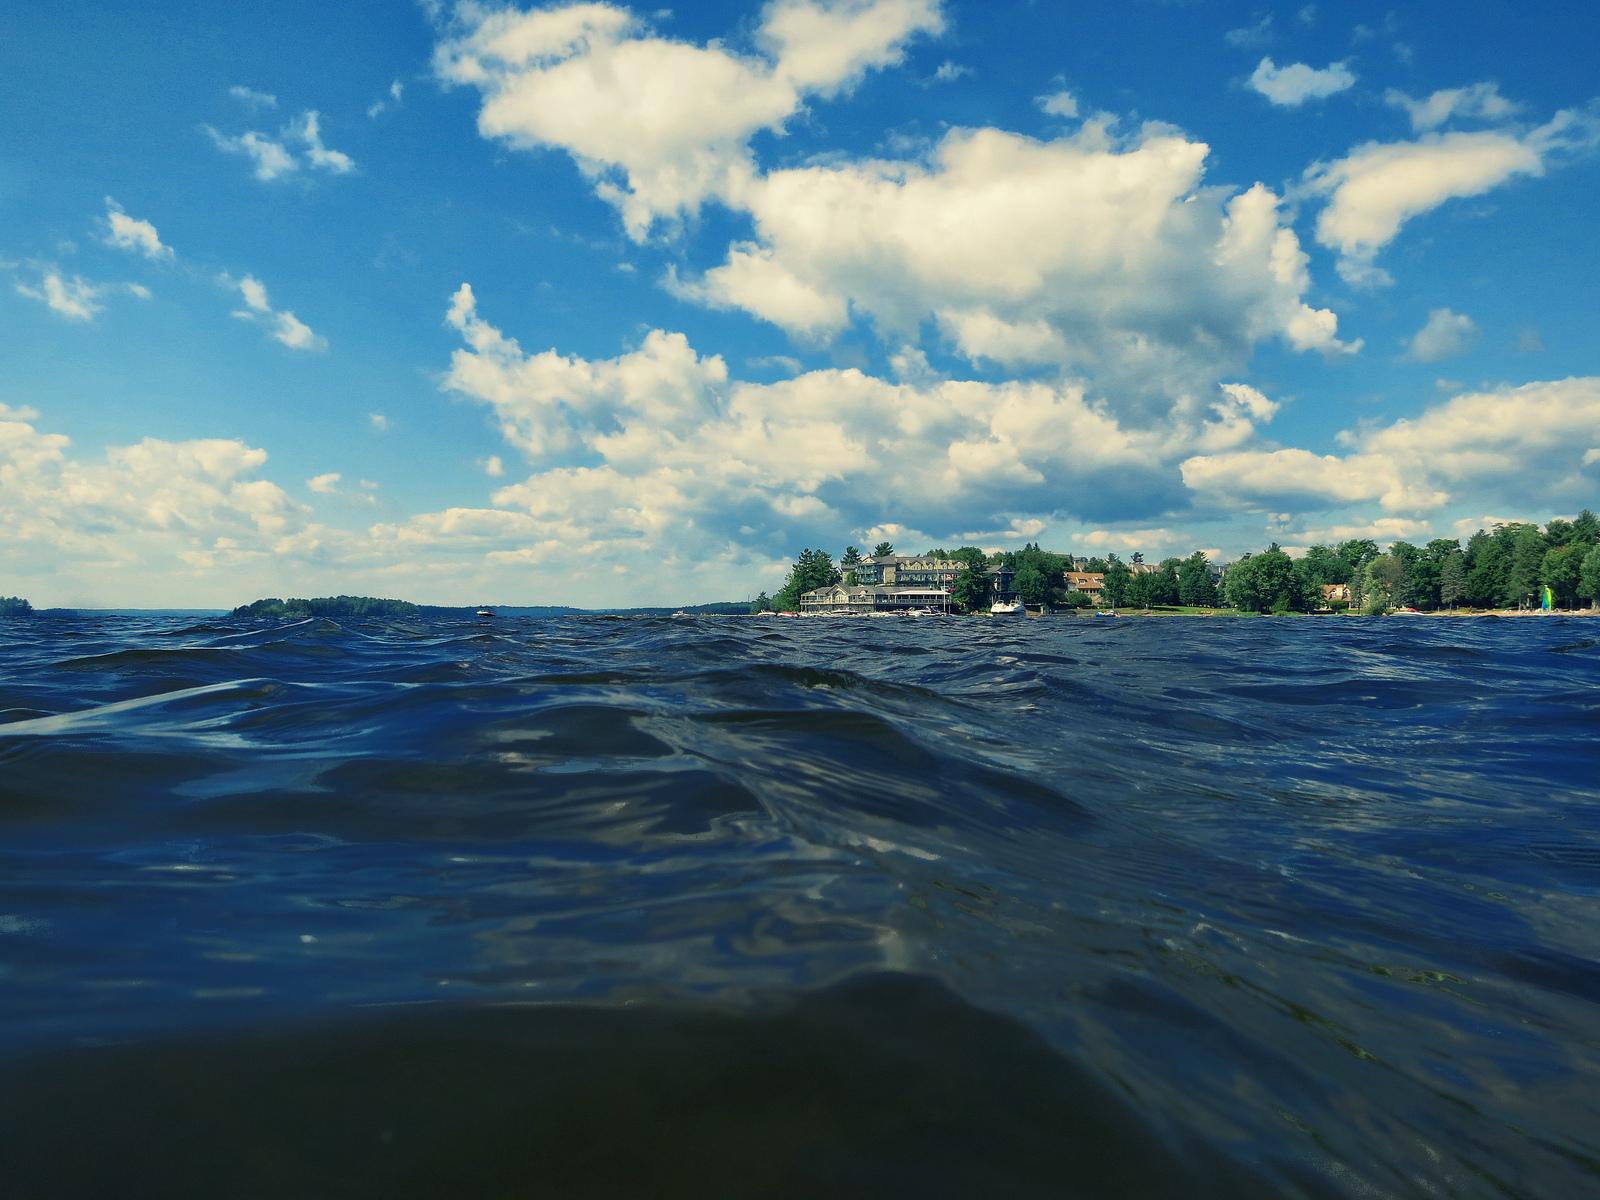 Lake Muskoka Lake Ontario